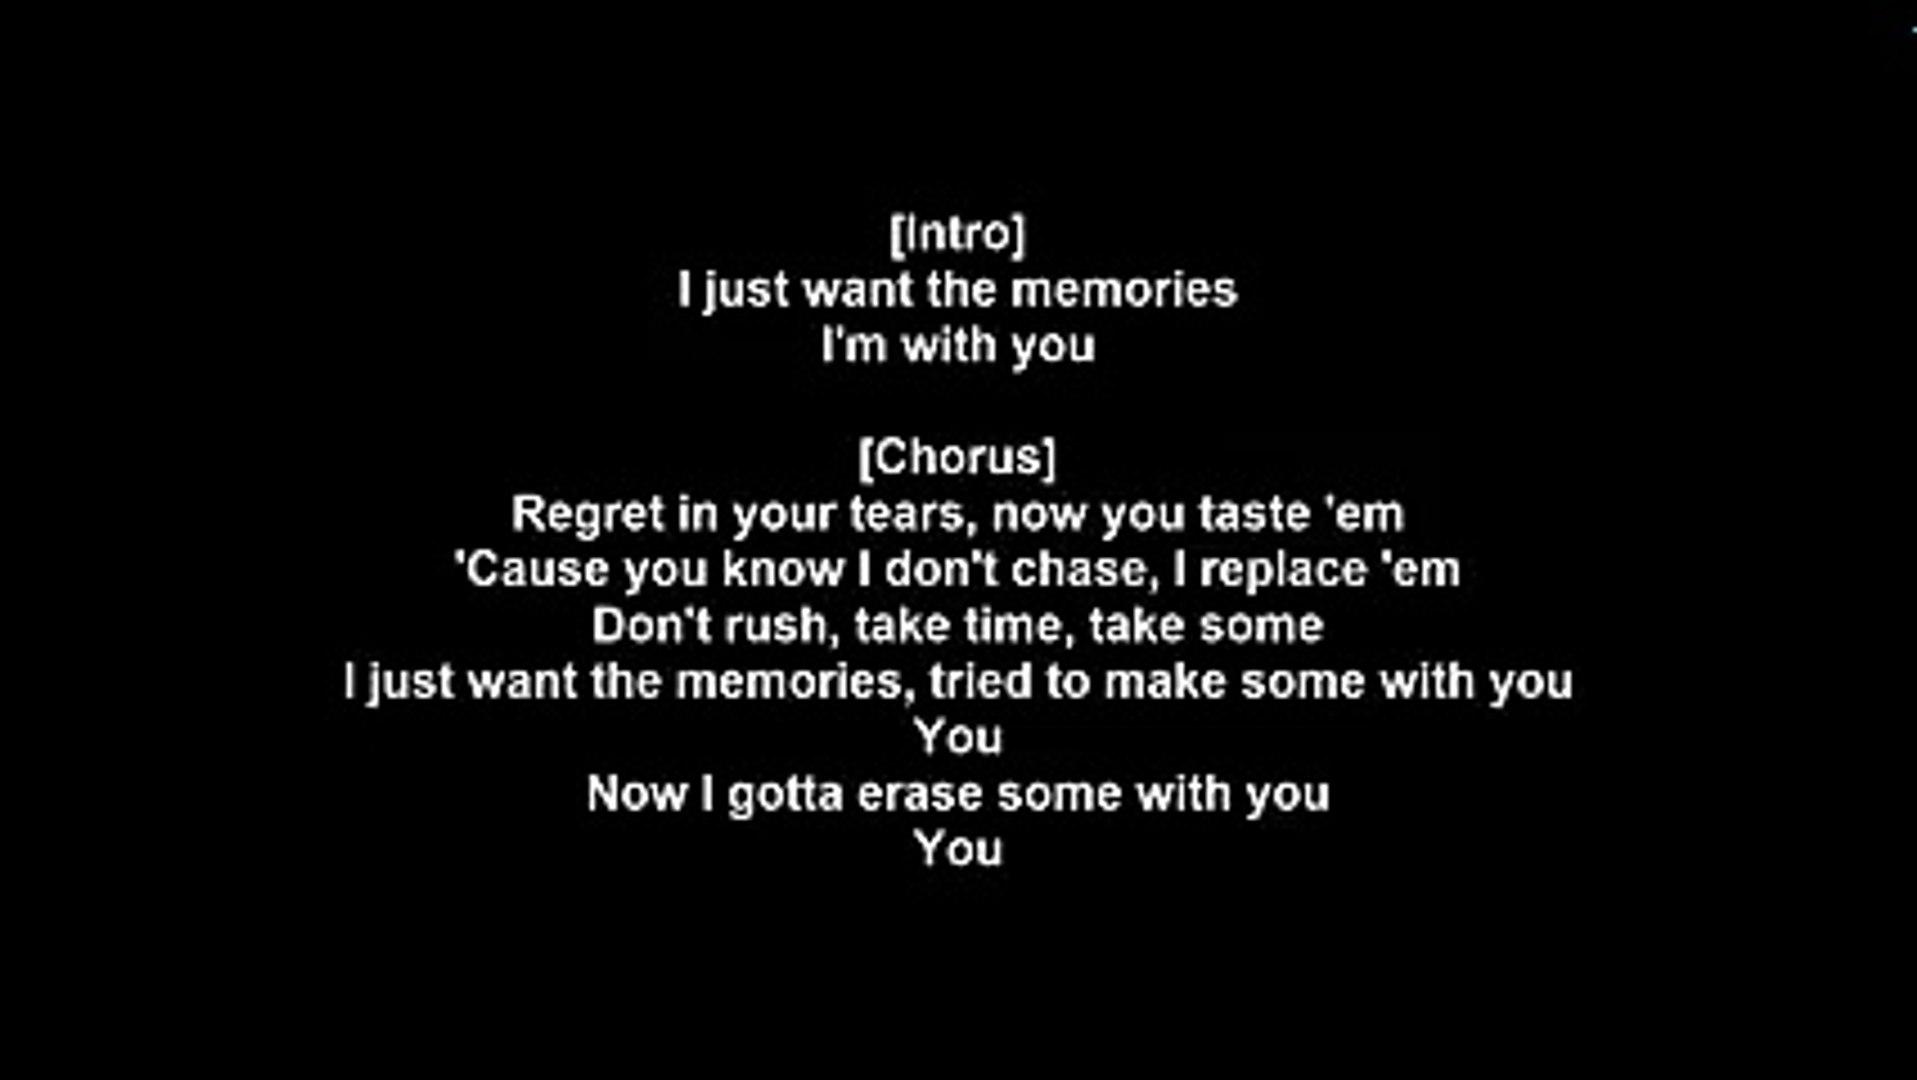 Nicki Minaj - Regret In Your Tears (Lyrics)